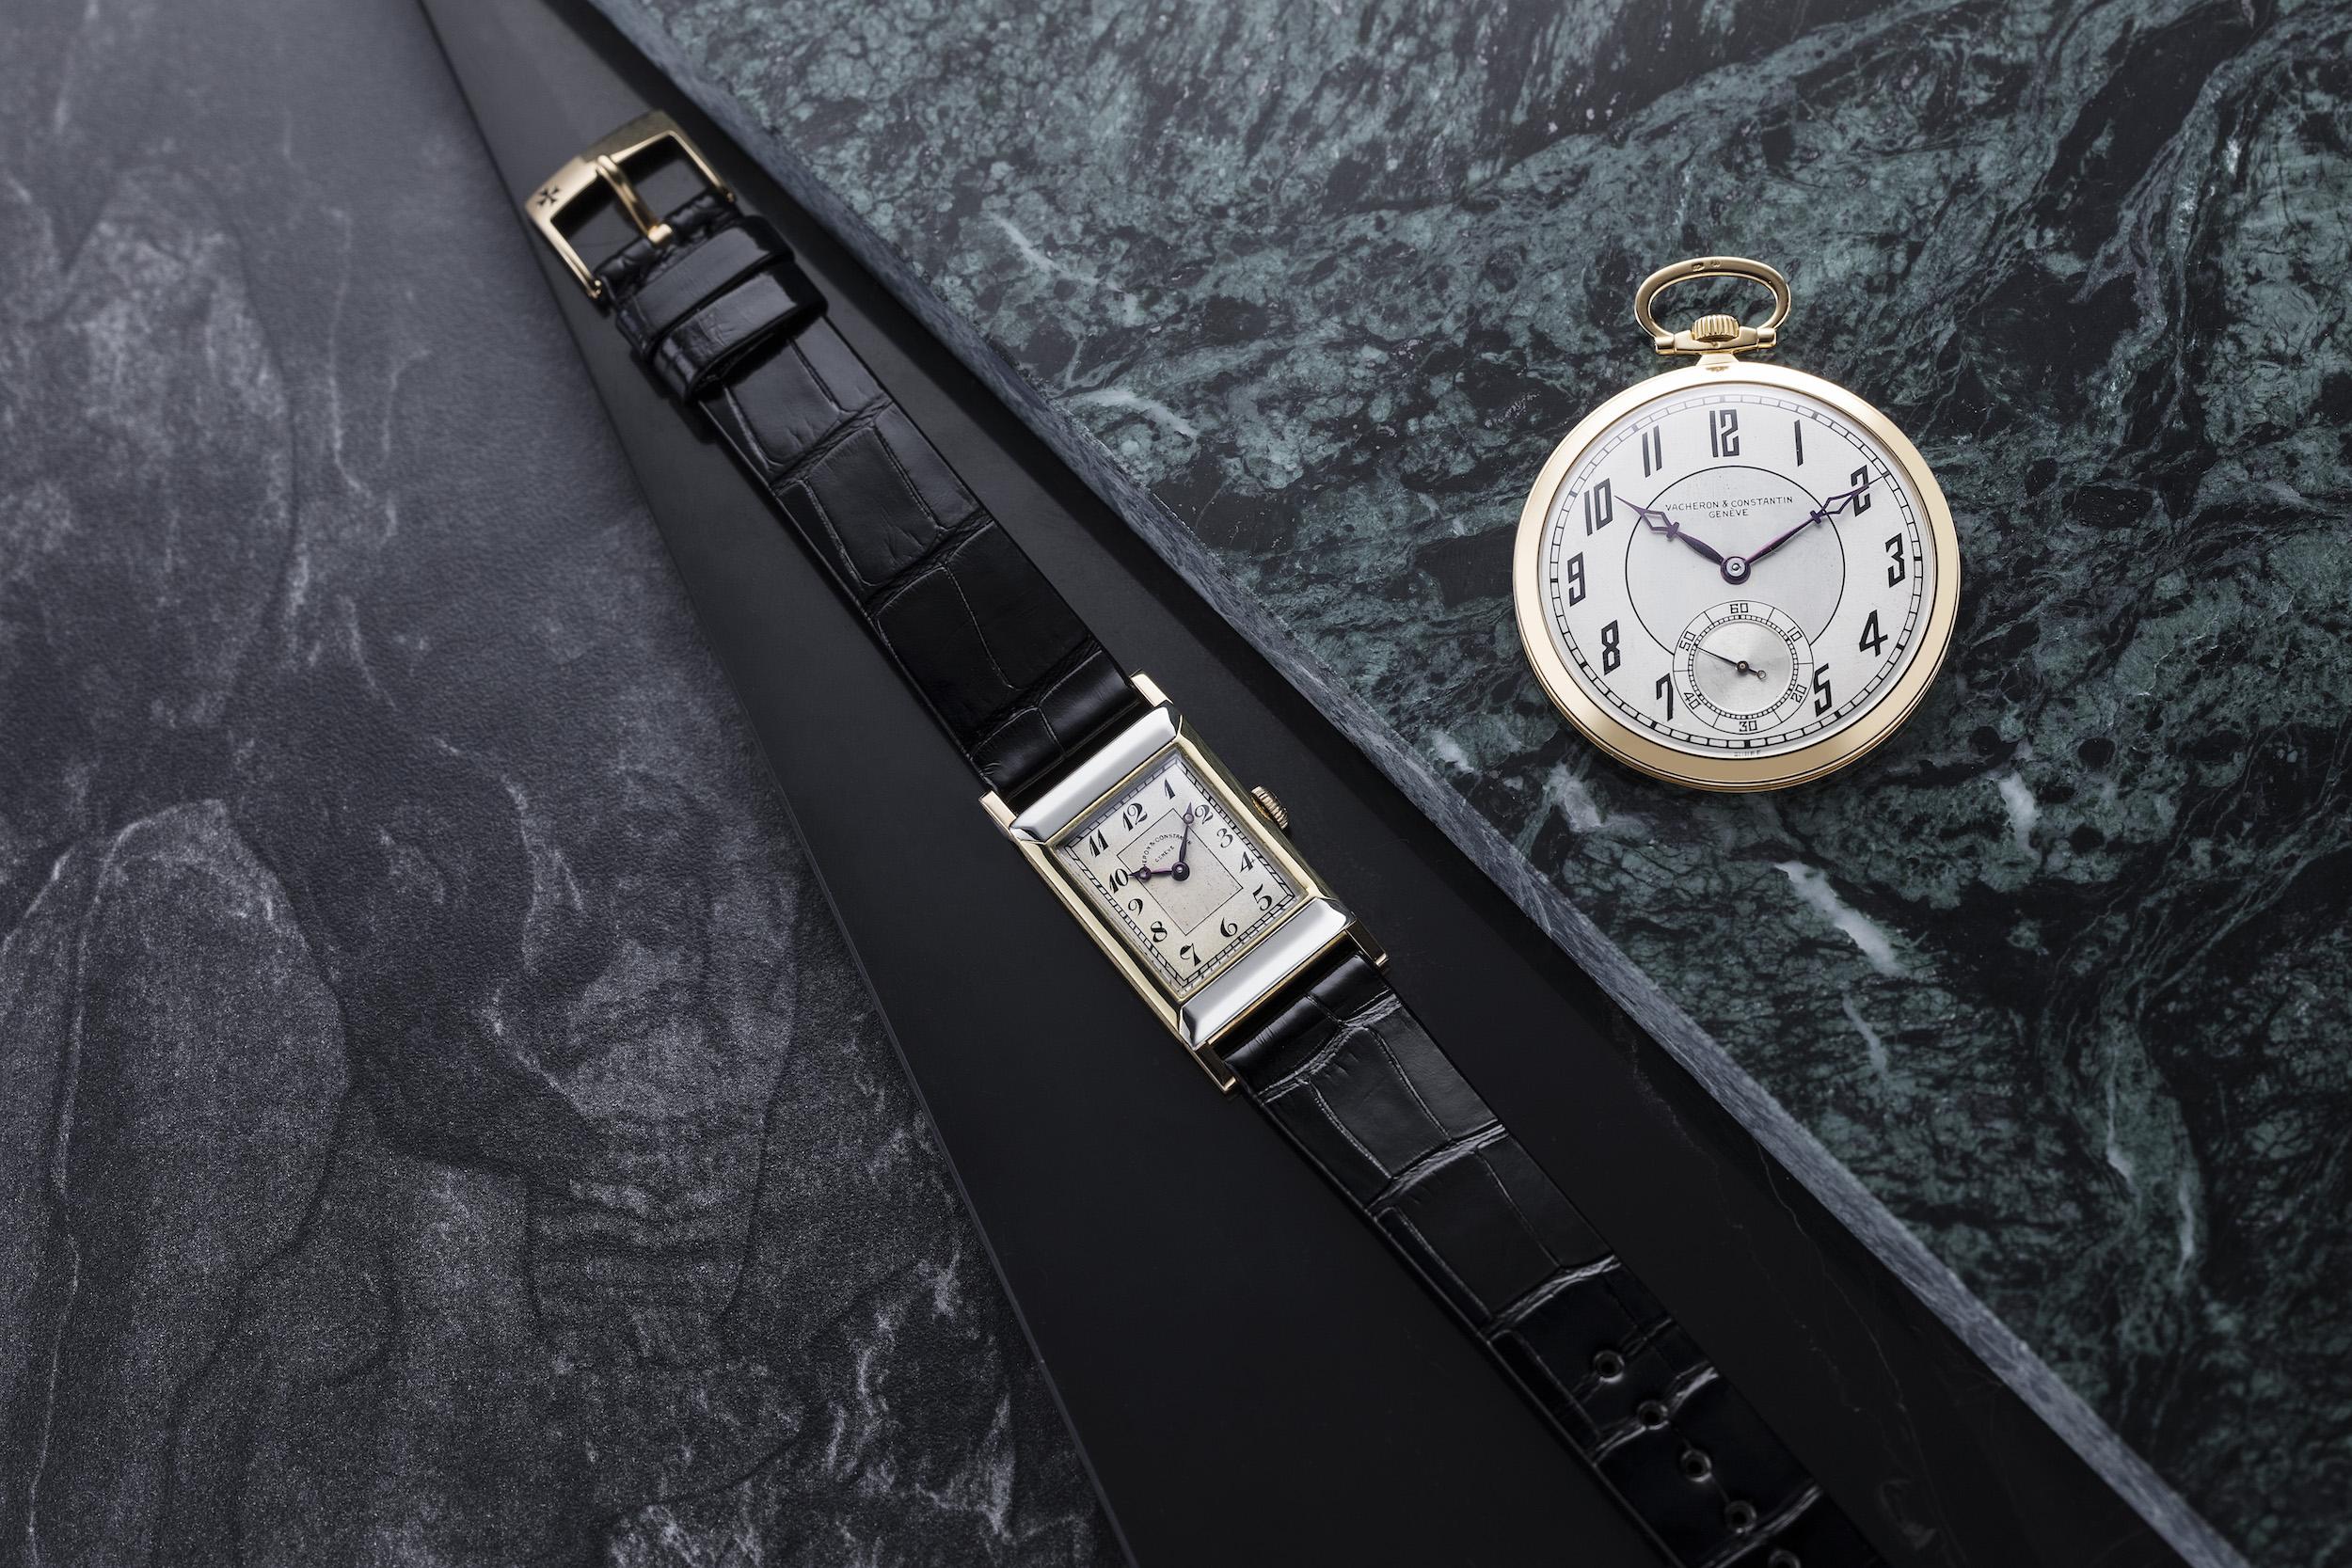 Vacheron Constantin Bringing 20 Exquisite Timepieces to London Concours